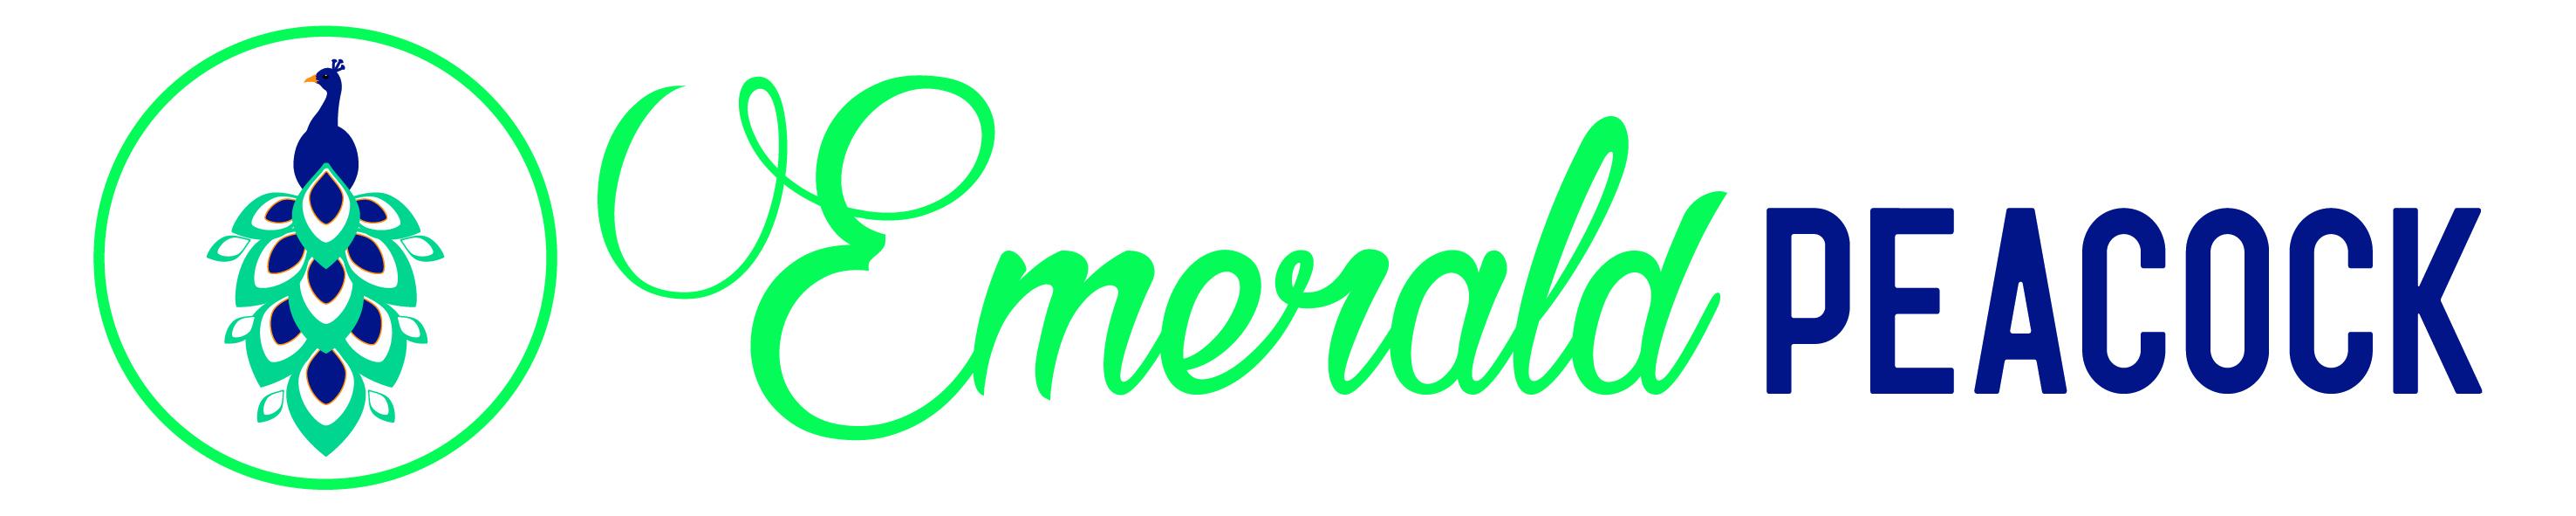 39260_emeraldpeacock-logo-horizontaal